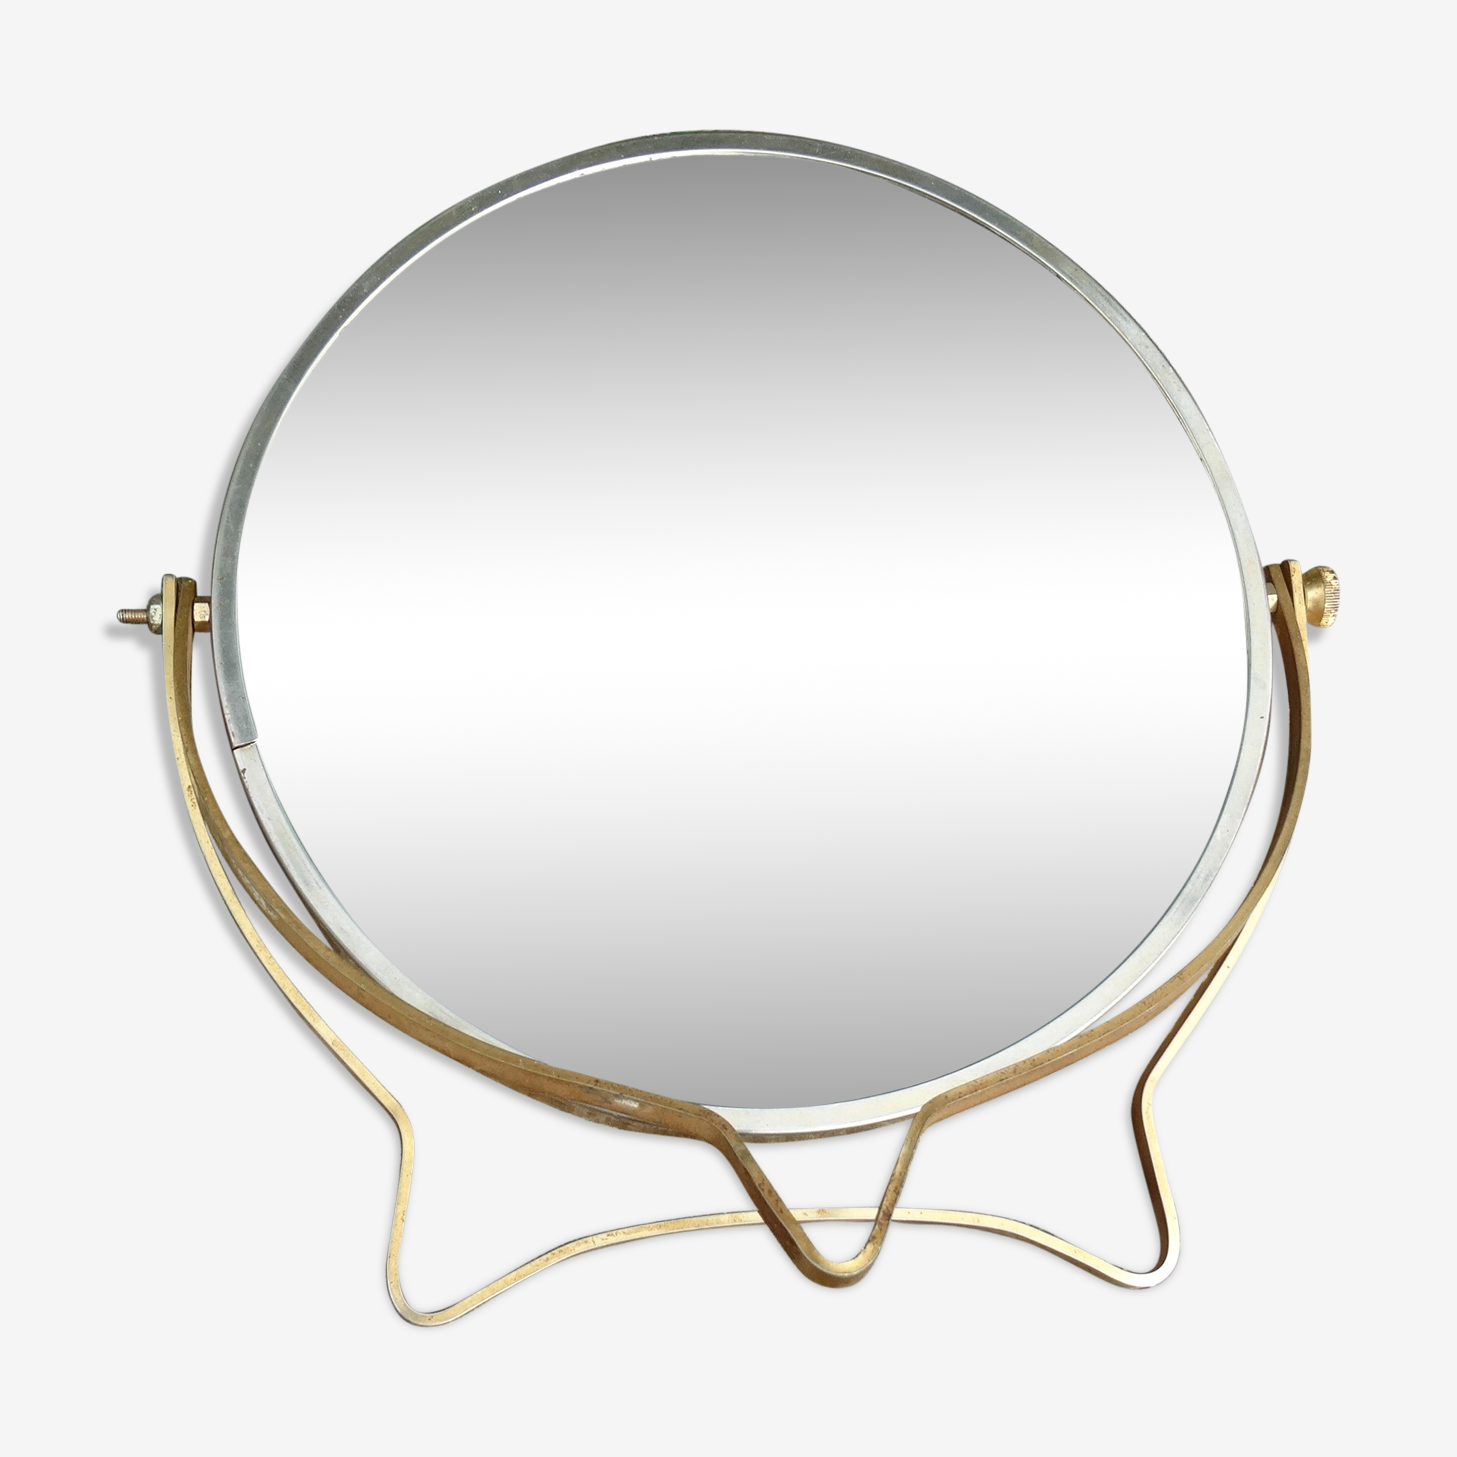 Miroir loupe de salle de bain  diamètre 20cm